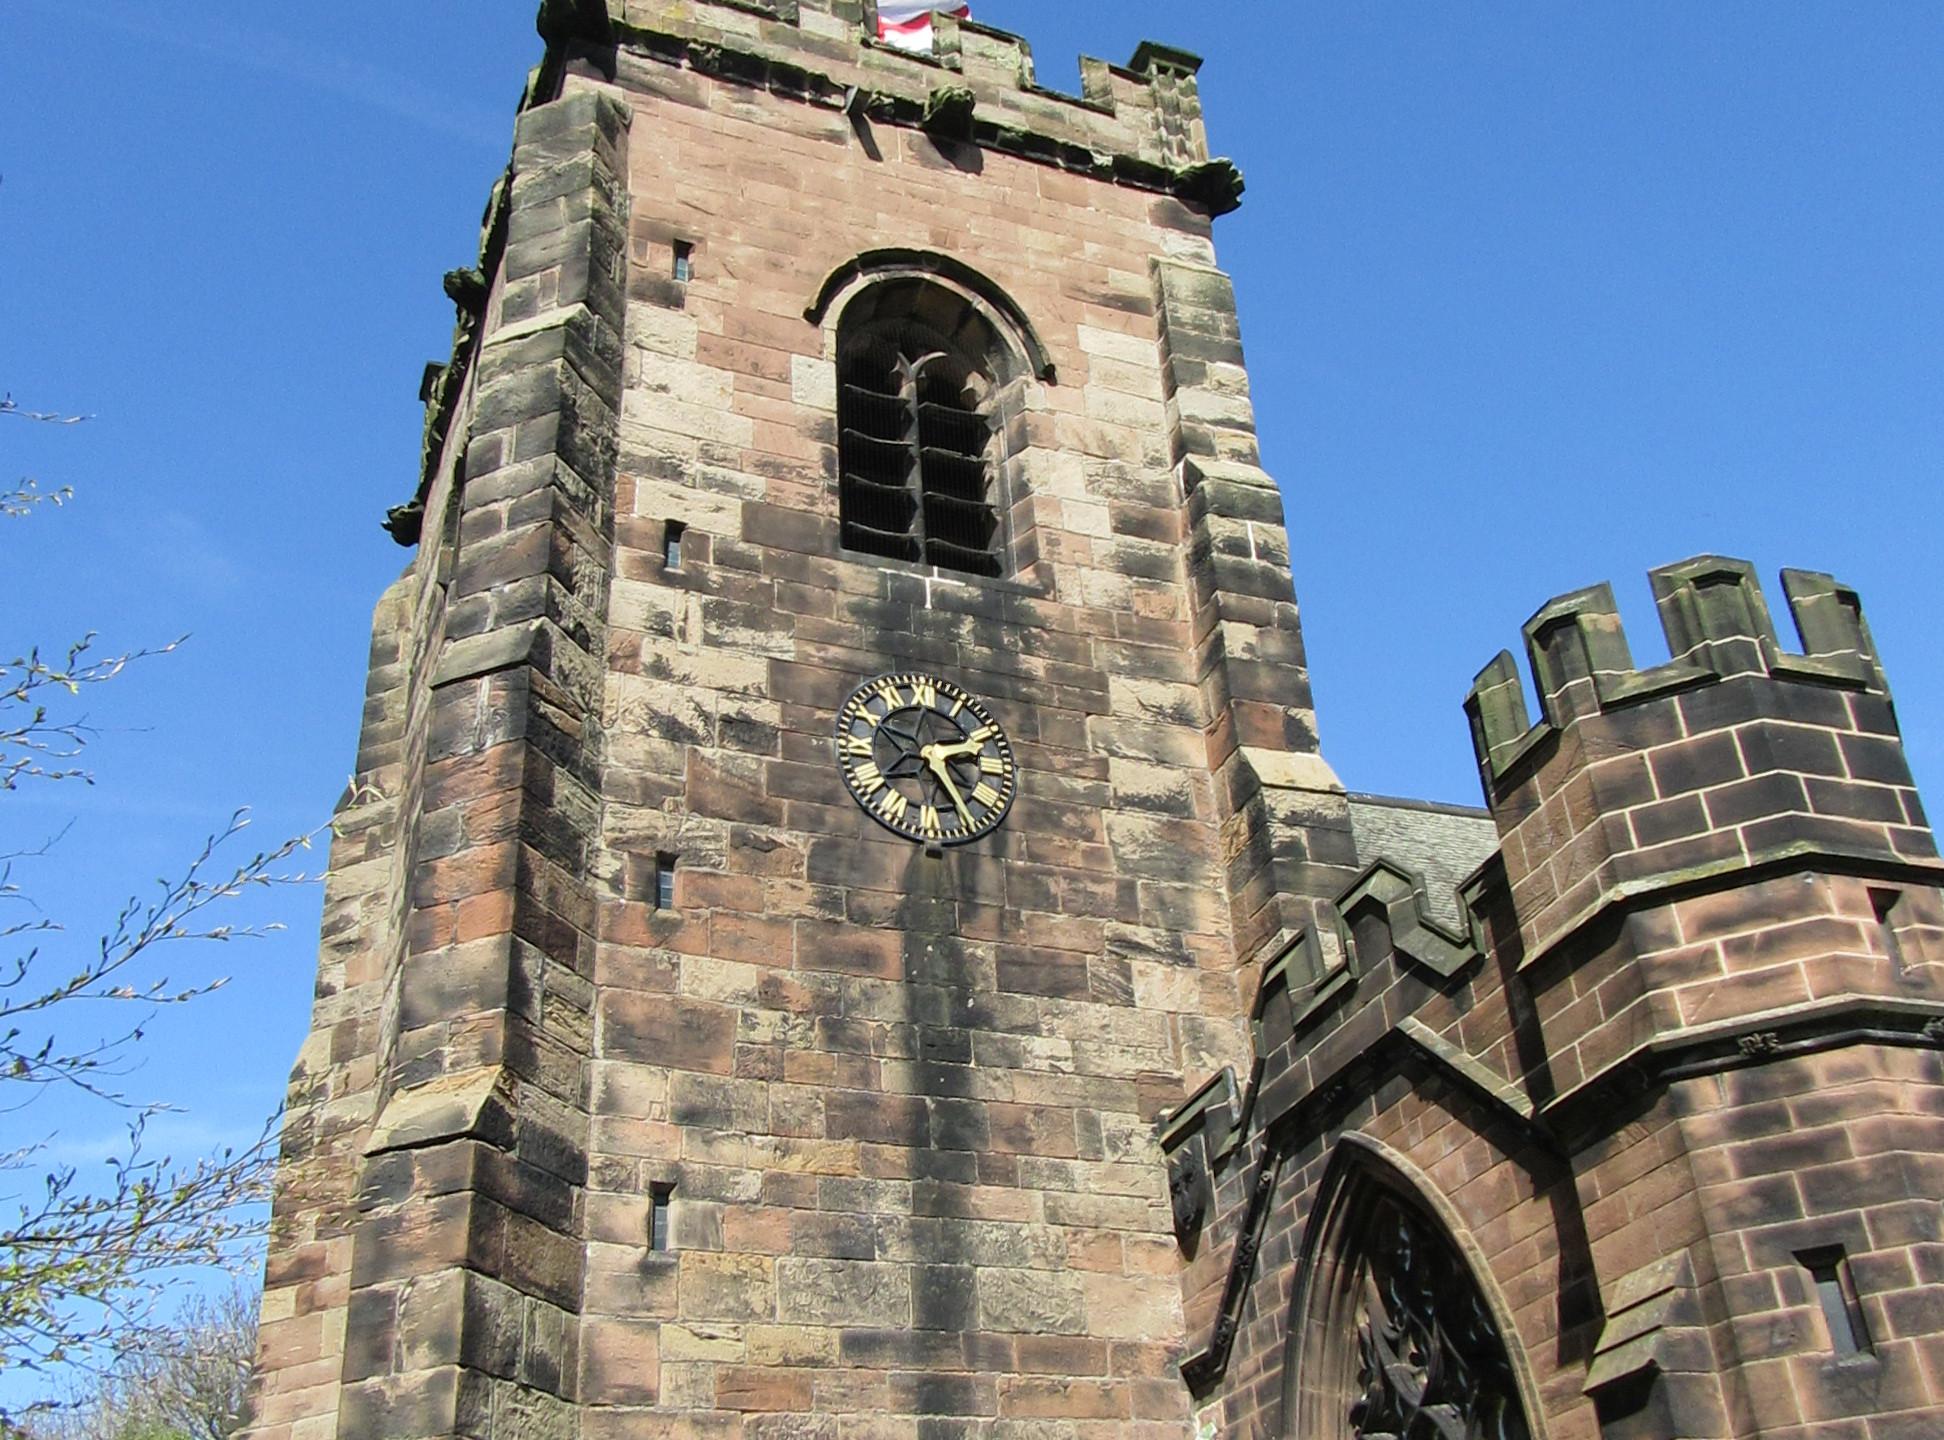 St Laurence Parish Church, Frodsham